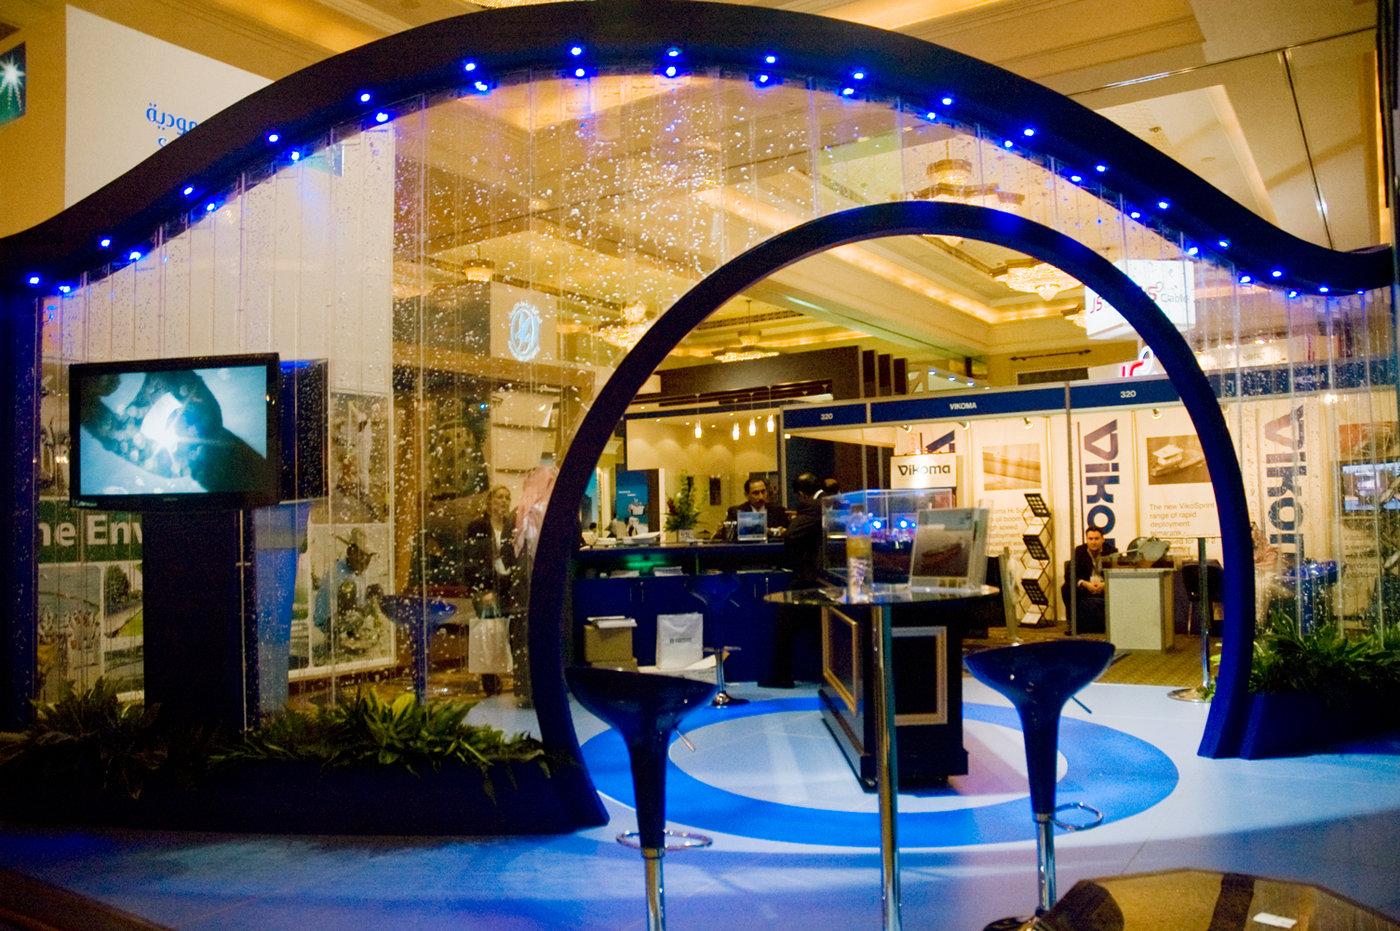 International Exhibition Stand Design : Exhibition stands by bigdot design at coroflot